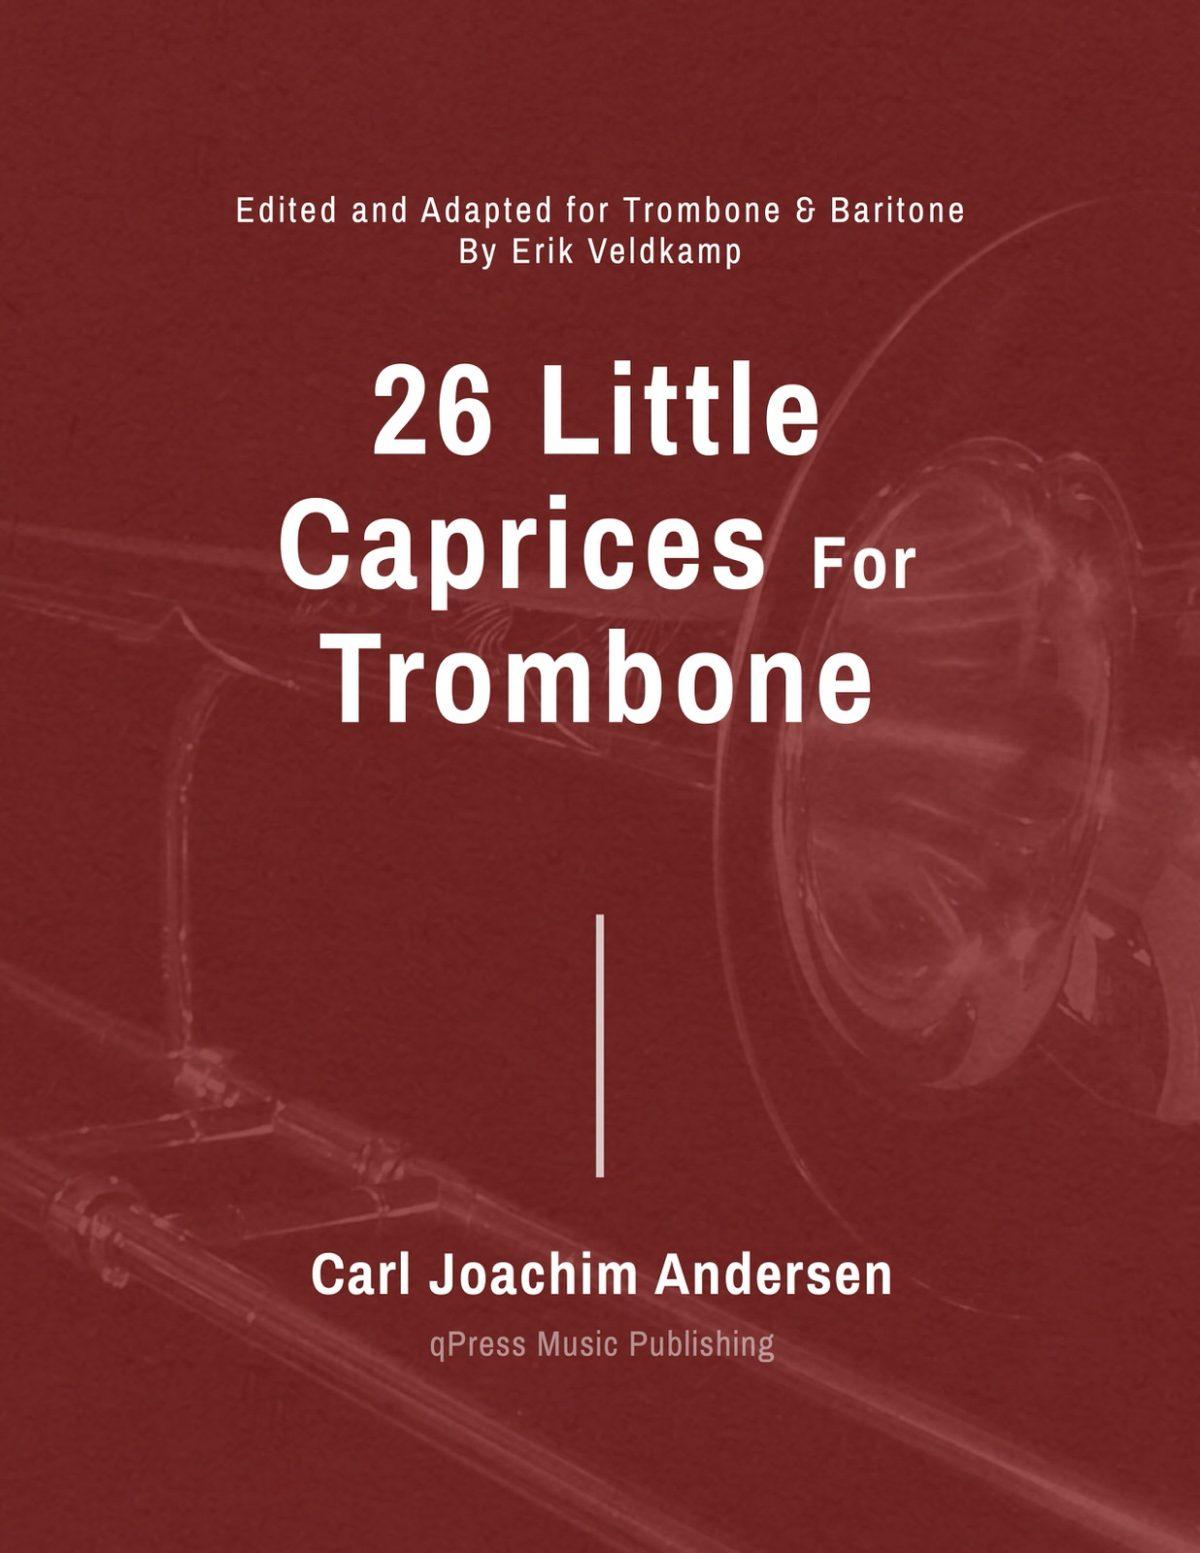 Andersen-Veldkamp, 26 Little Caprices Trombone and Baritone-p01